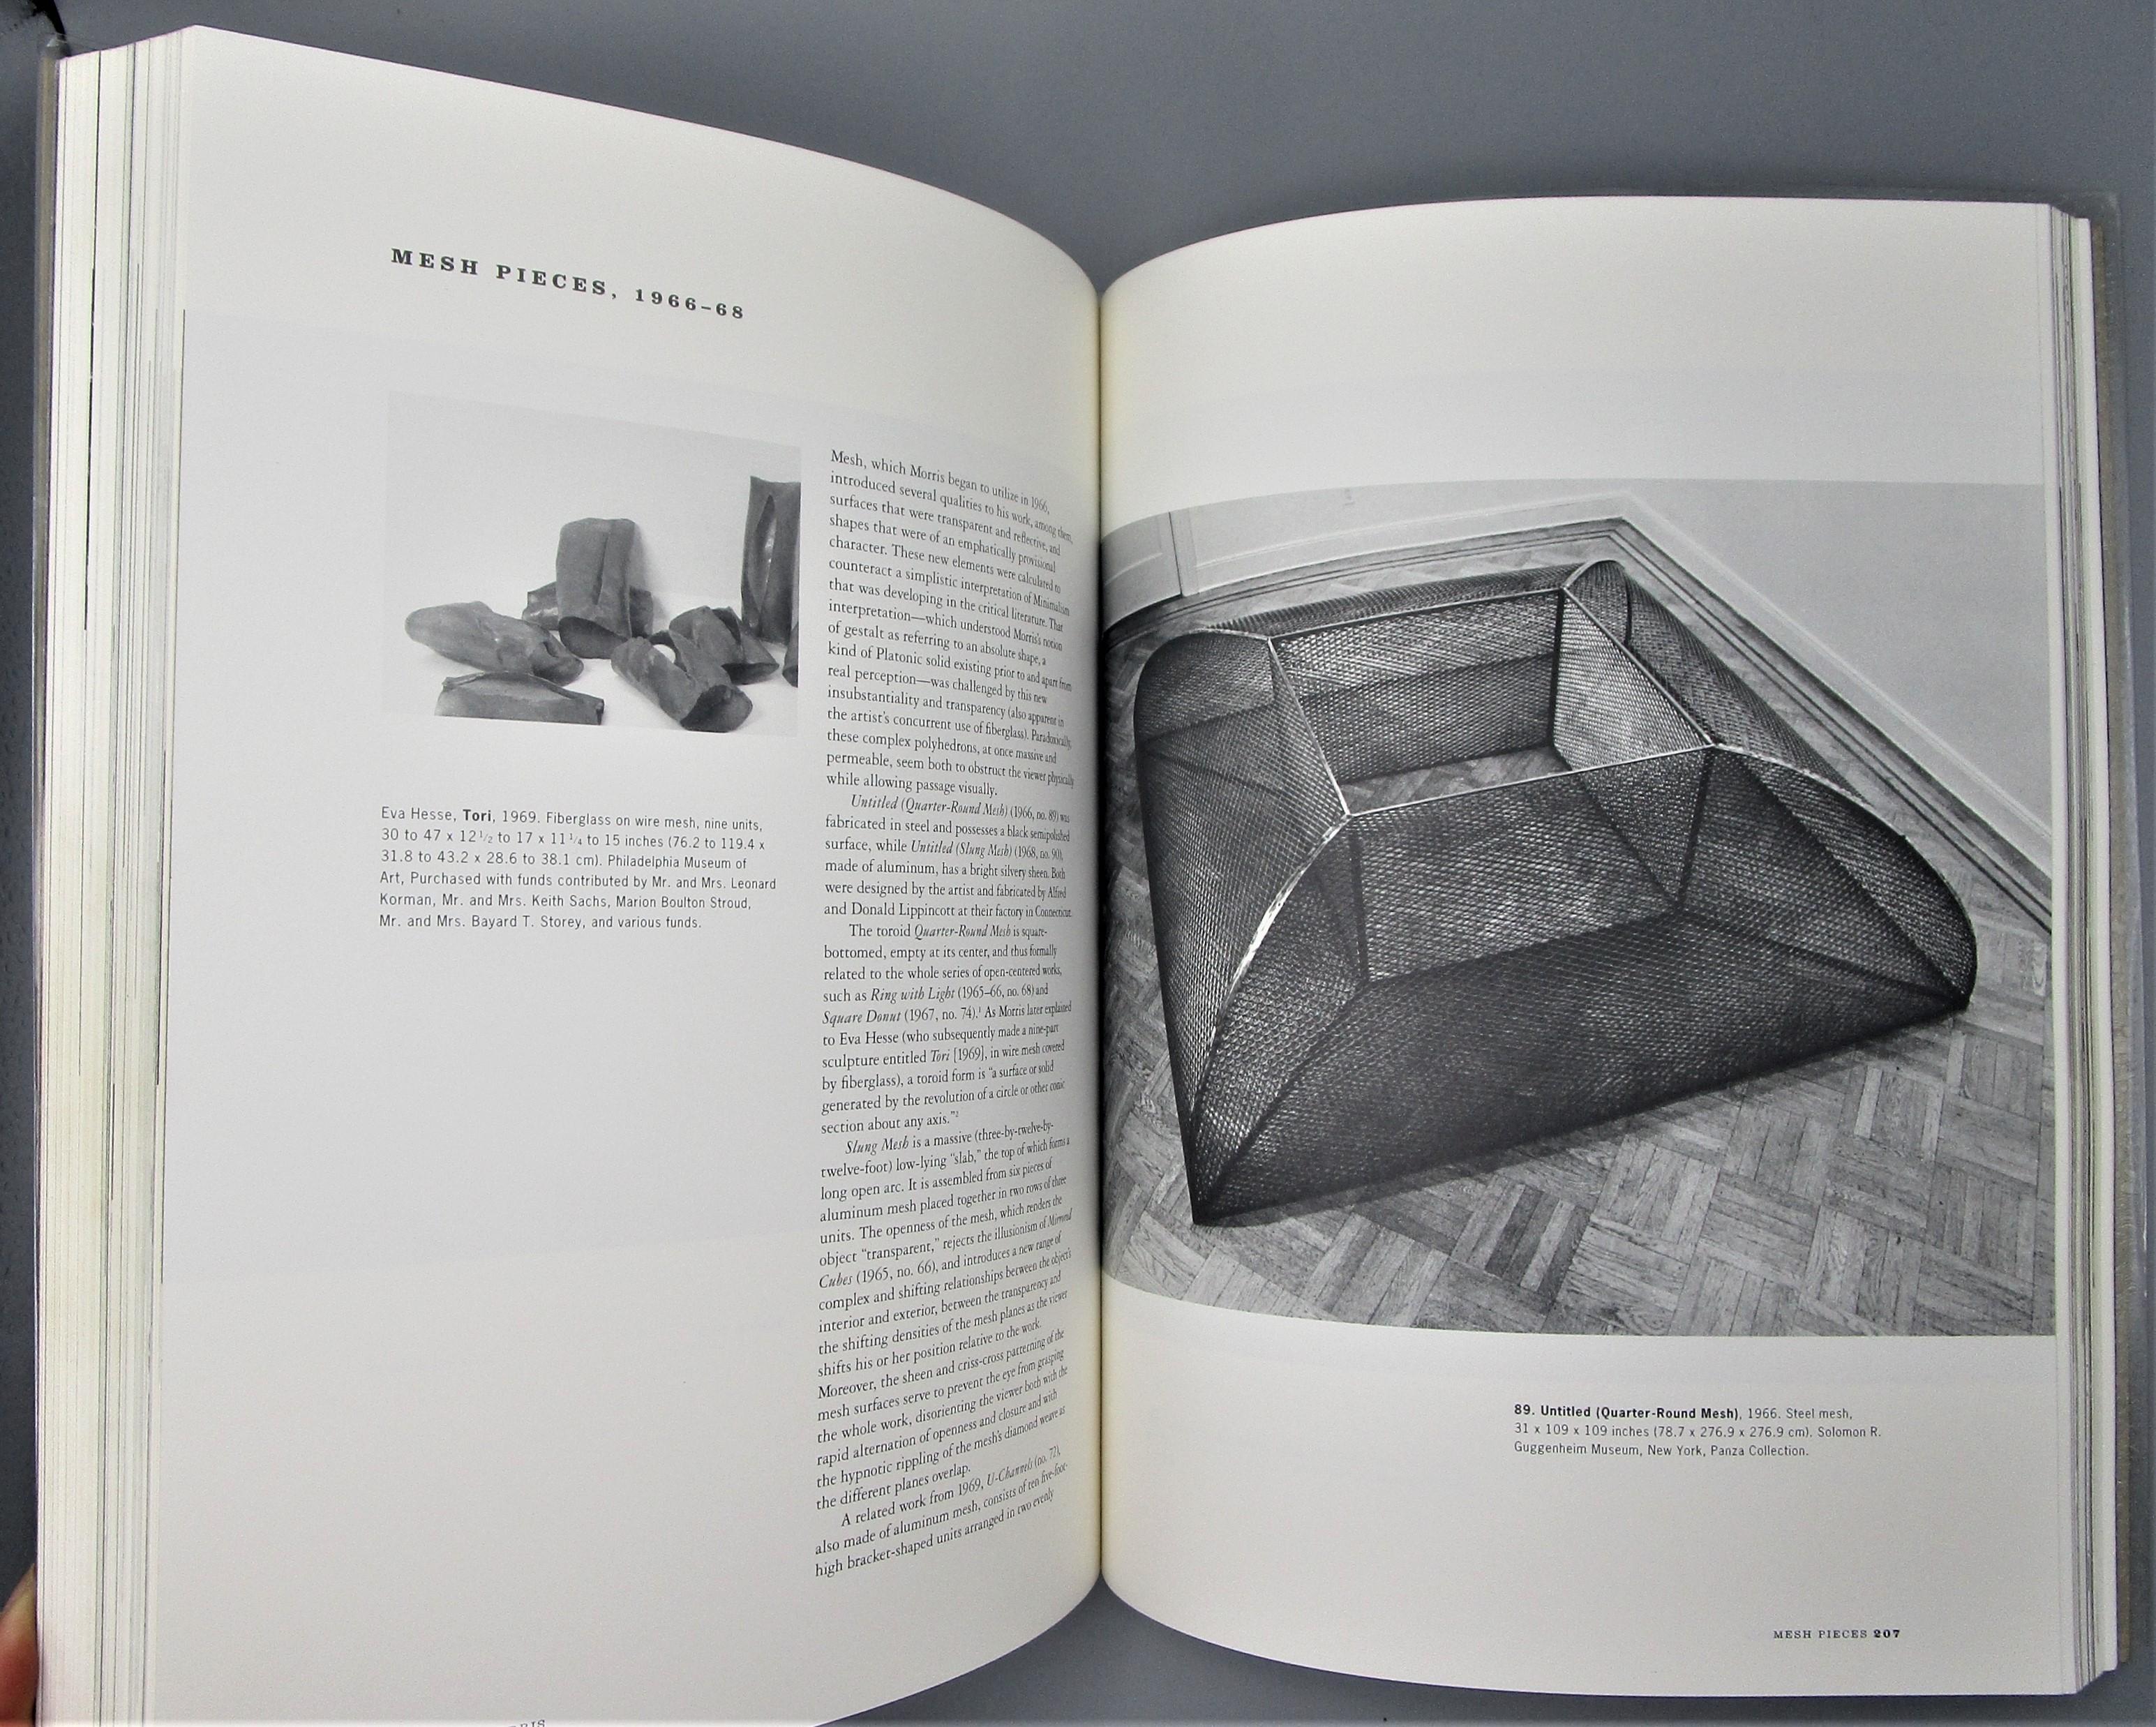 ROBERT MORRIS: THE MIND/BODY PROBLEM - 1994 [Signed]